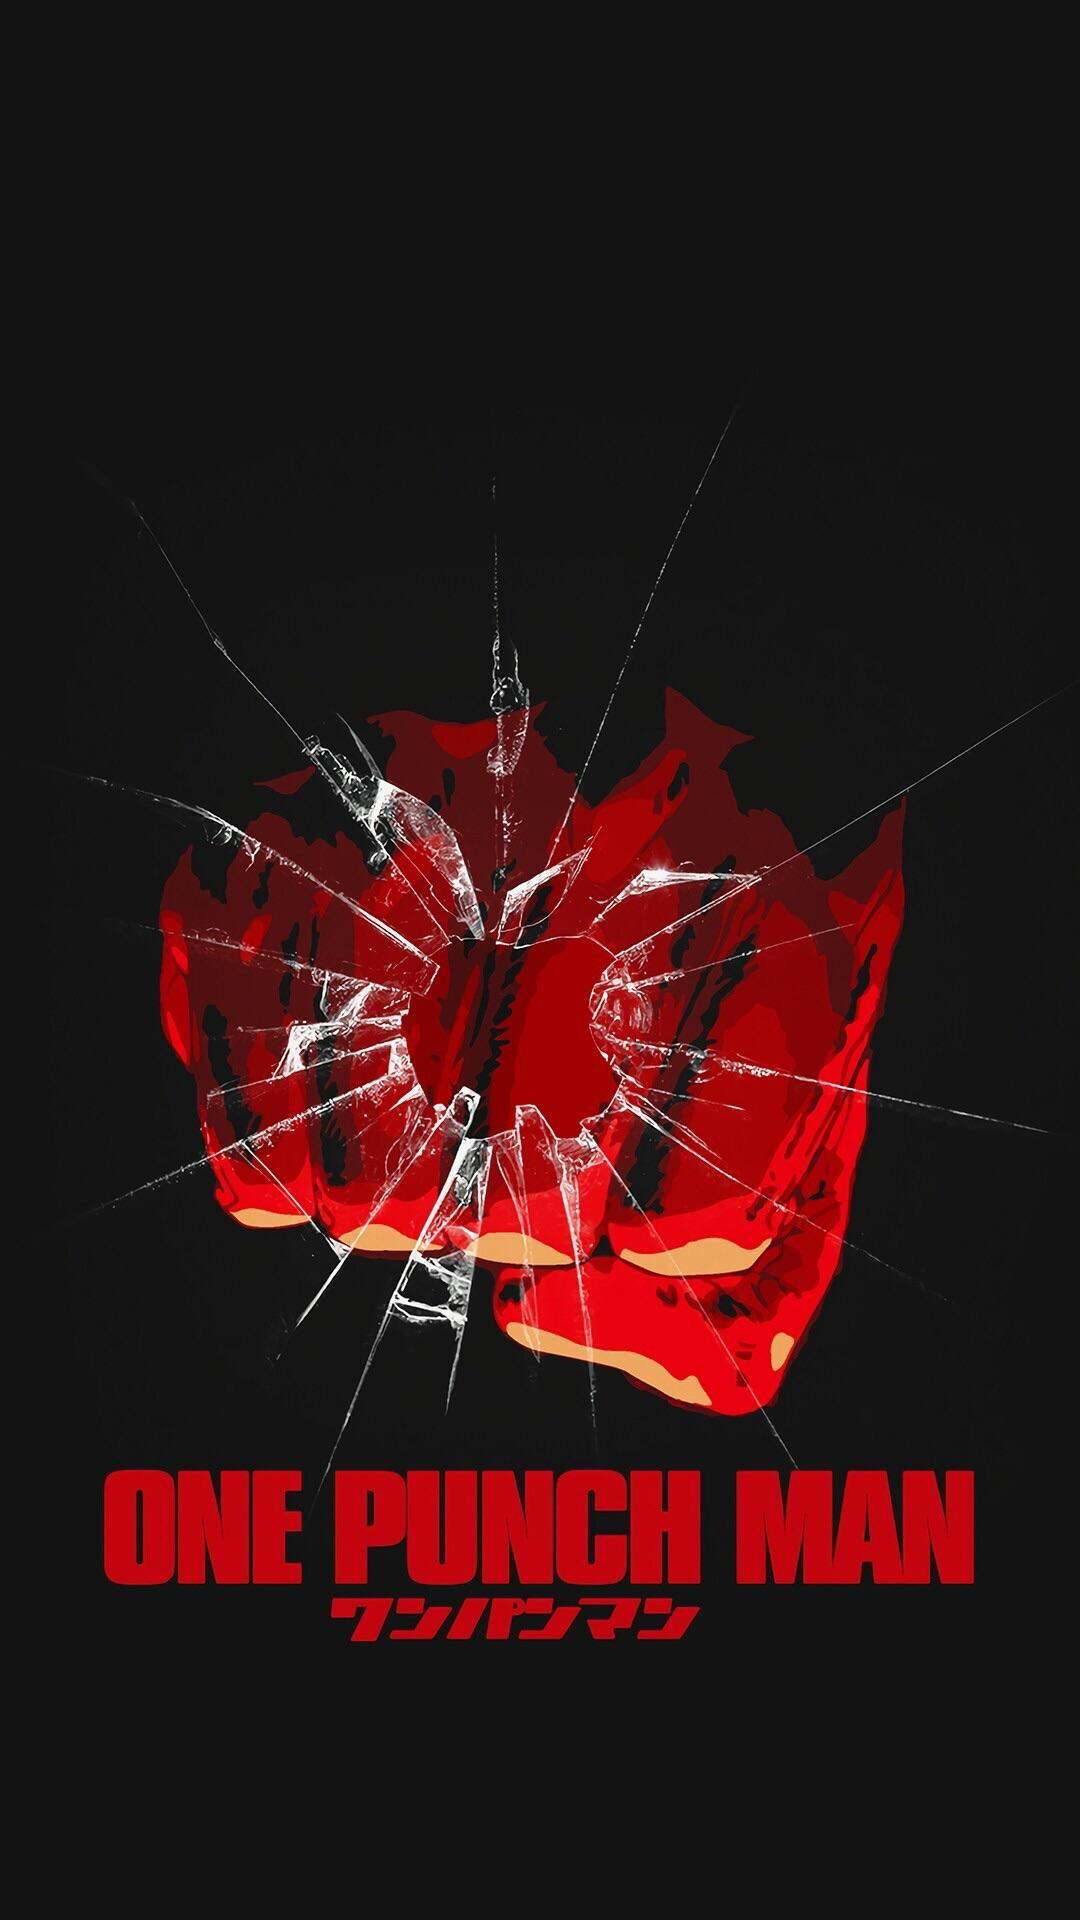 Cracked Screen One Punch Man 1080x1920 Music Indieartist Chicago One Punch Man Anime One Punch Man One Punch Man Manga